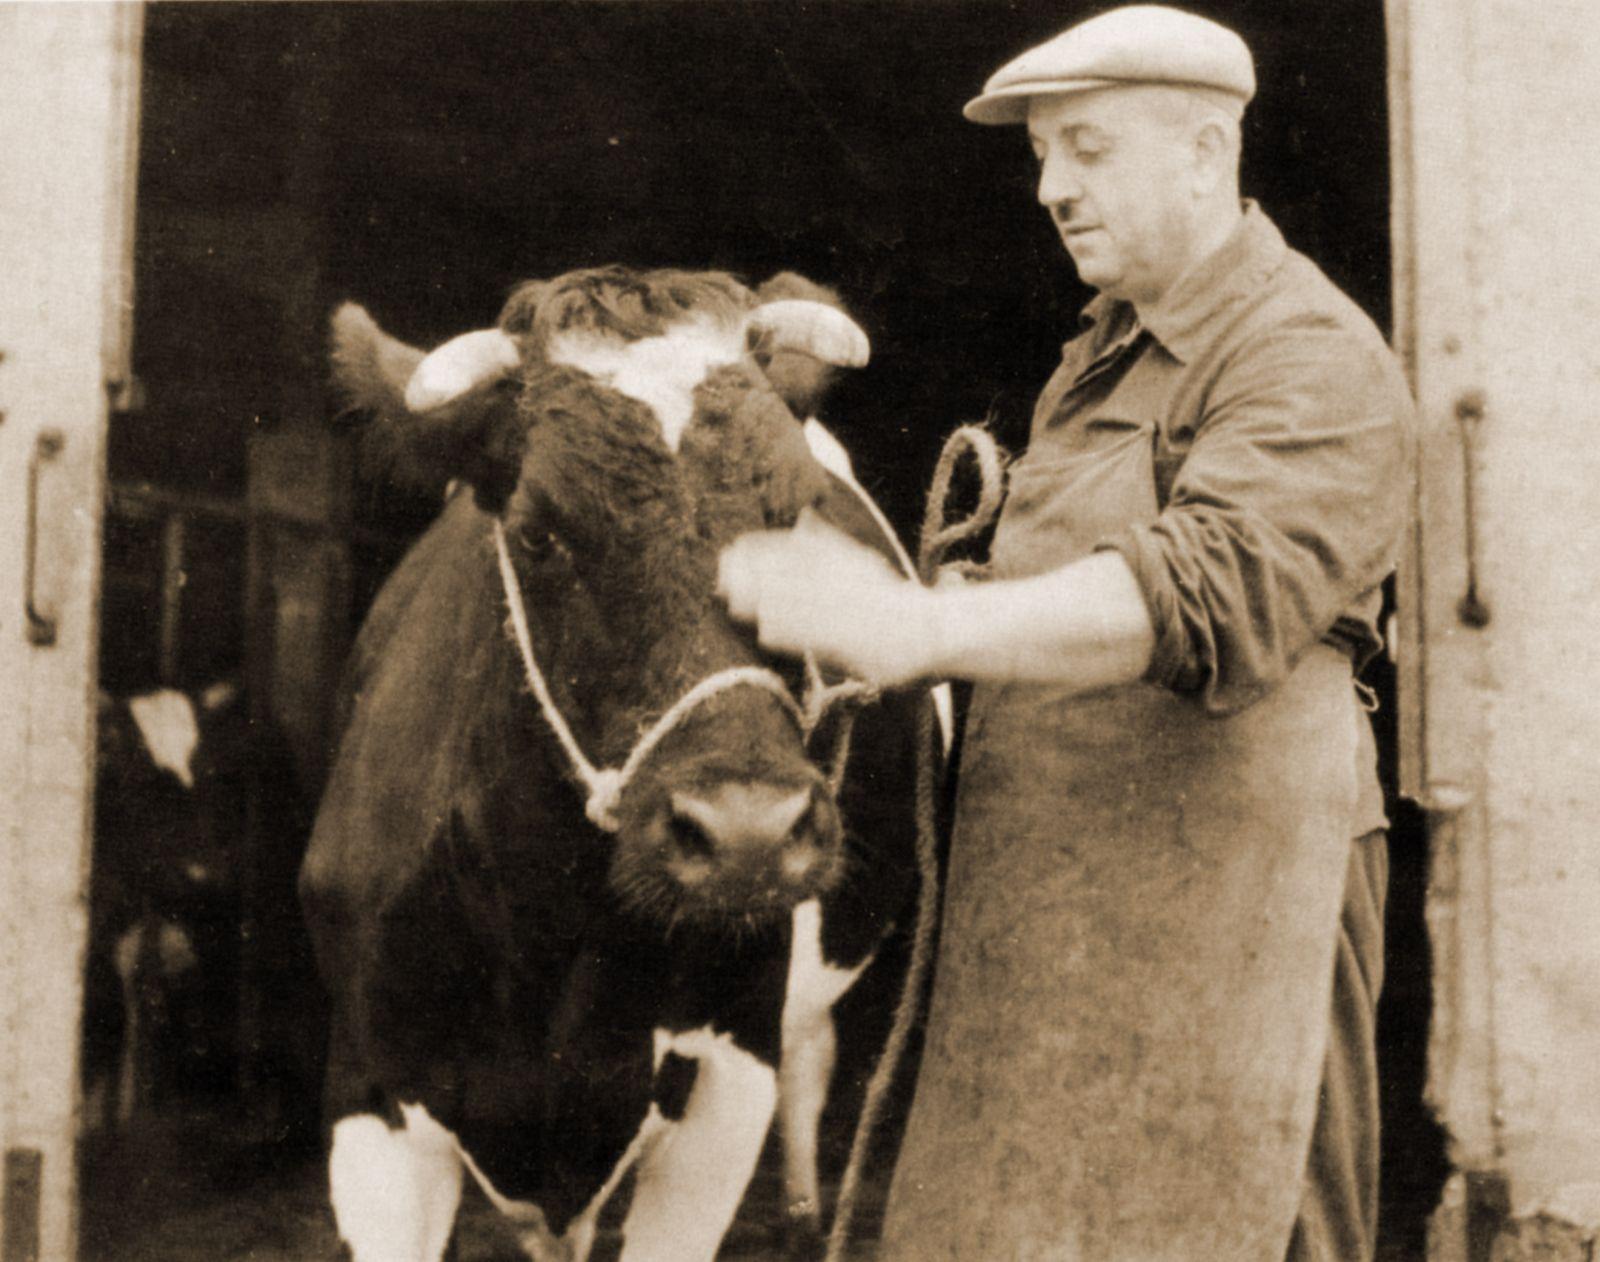 Viehhändler Fröhlich